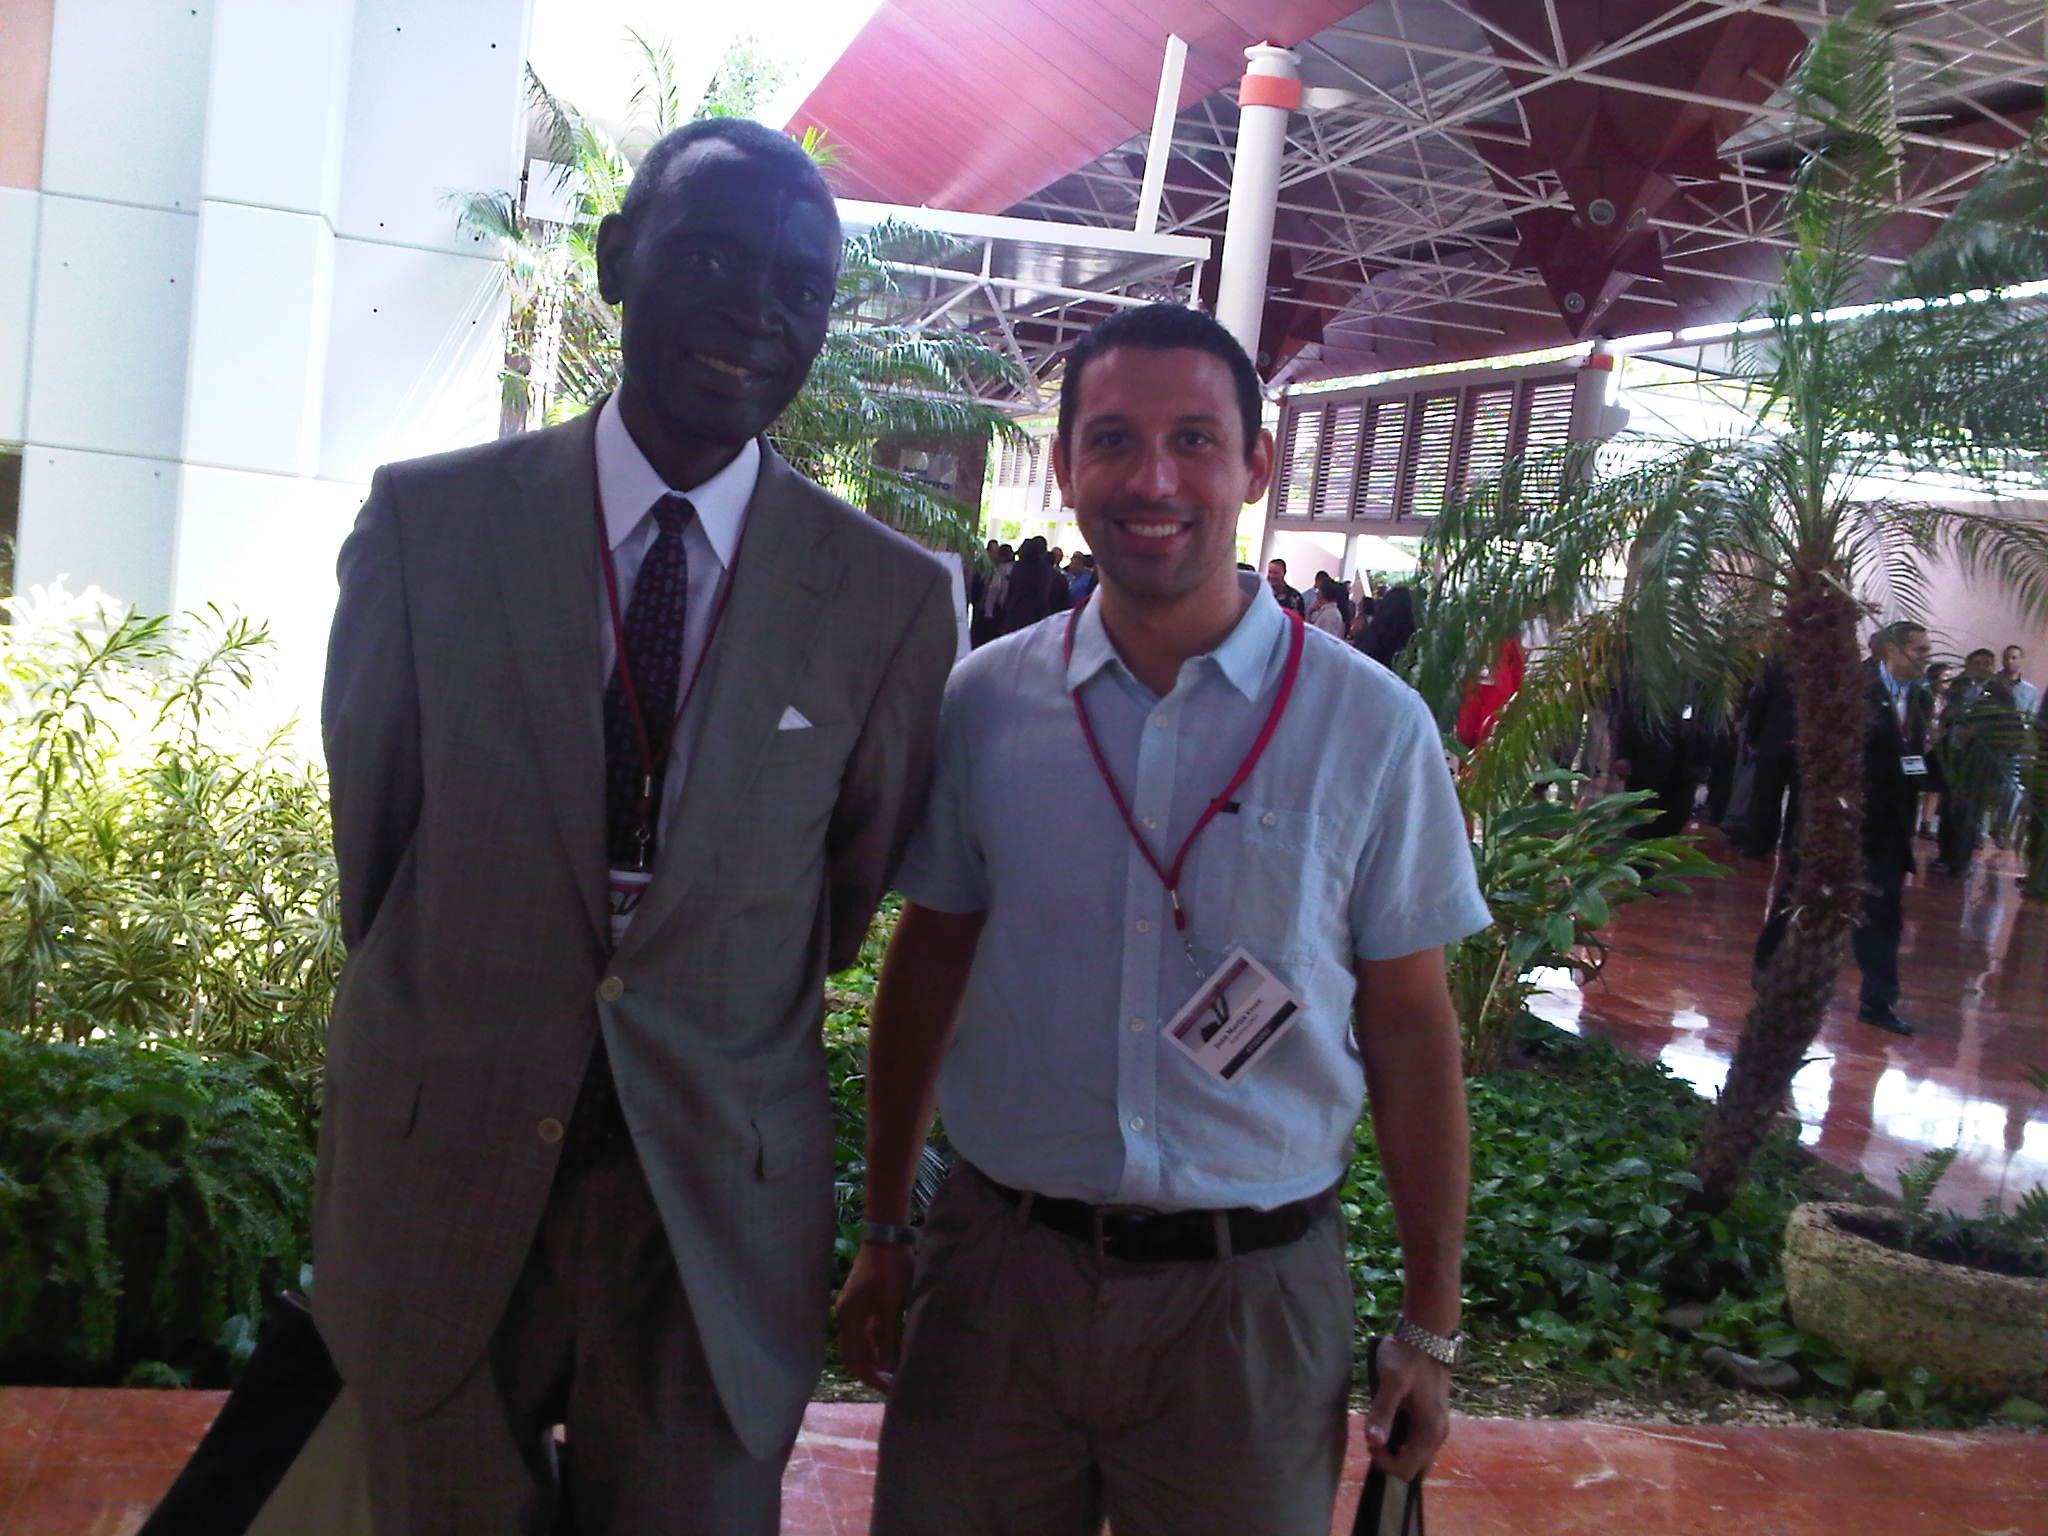 El Dr. Vives junto a Daniel Ntanda Nsereko, un adventista ugandés.